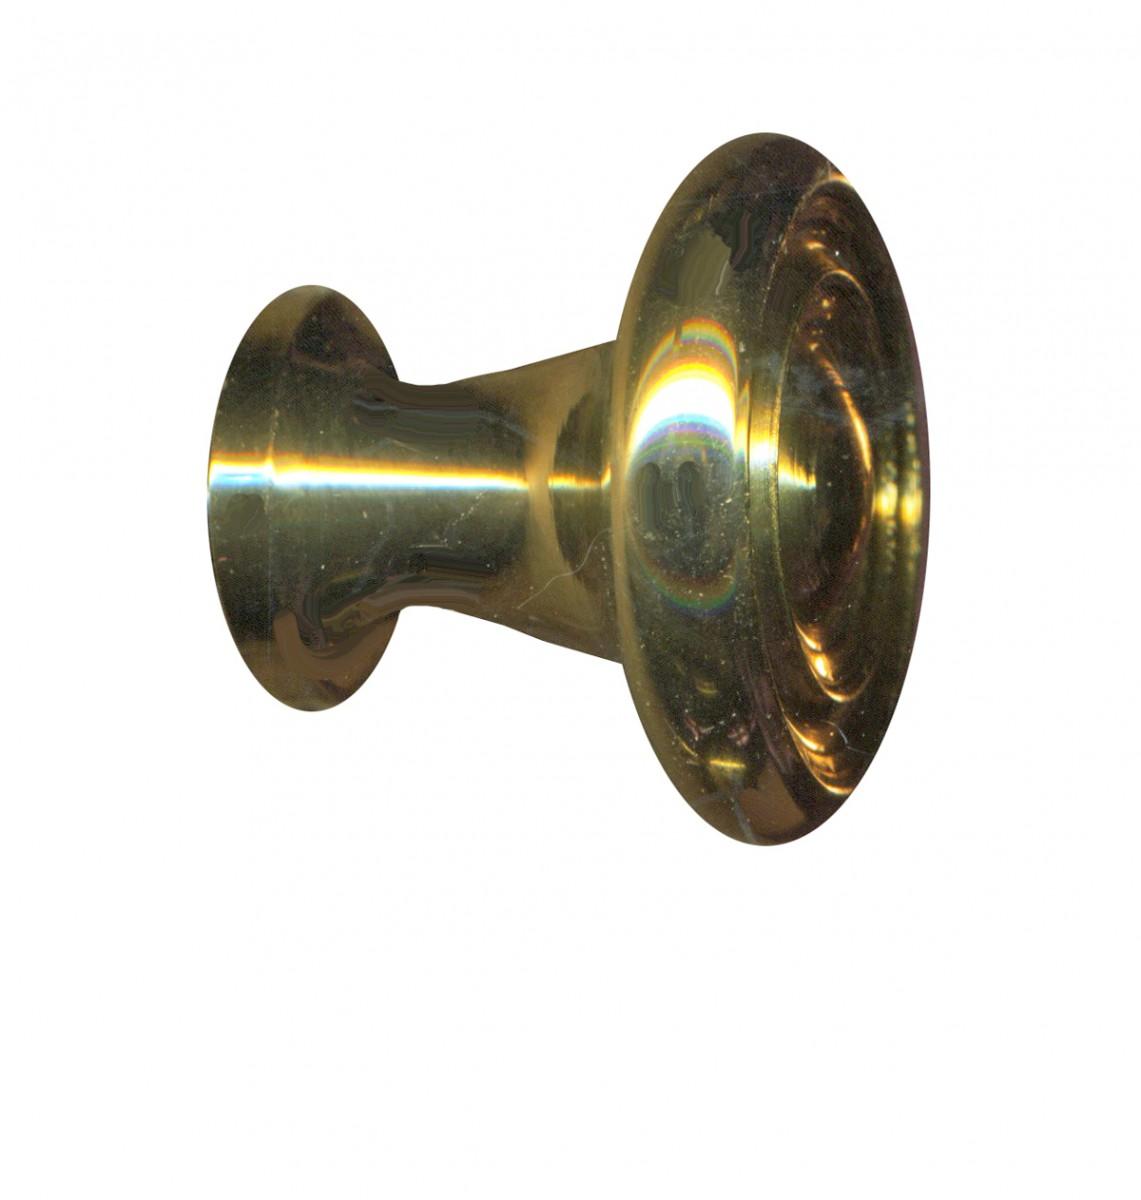 cabinet knob bright solid brass spooled 1 dia. Black Bedroom Furniture Sets. Home Design Ideas